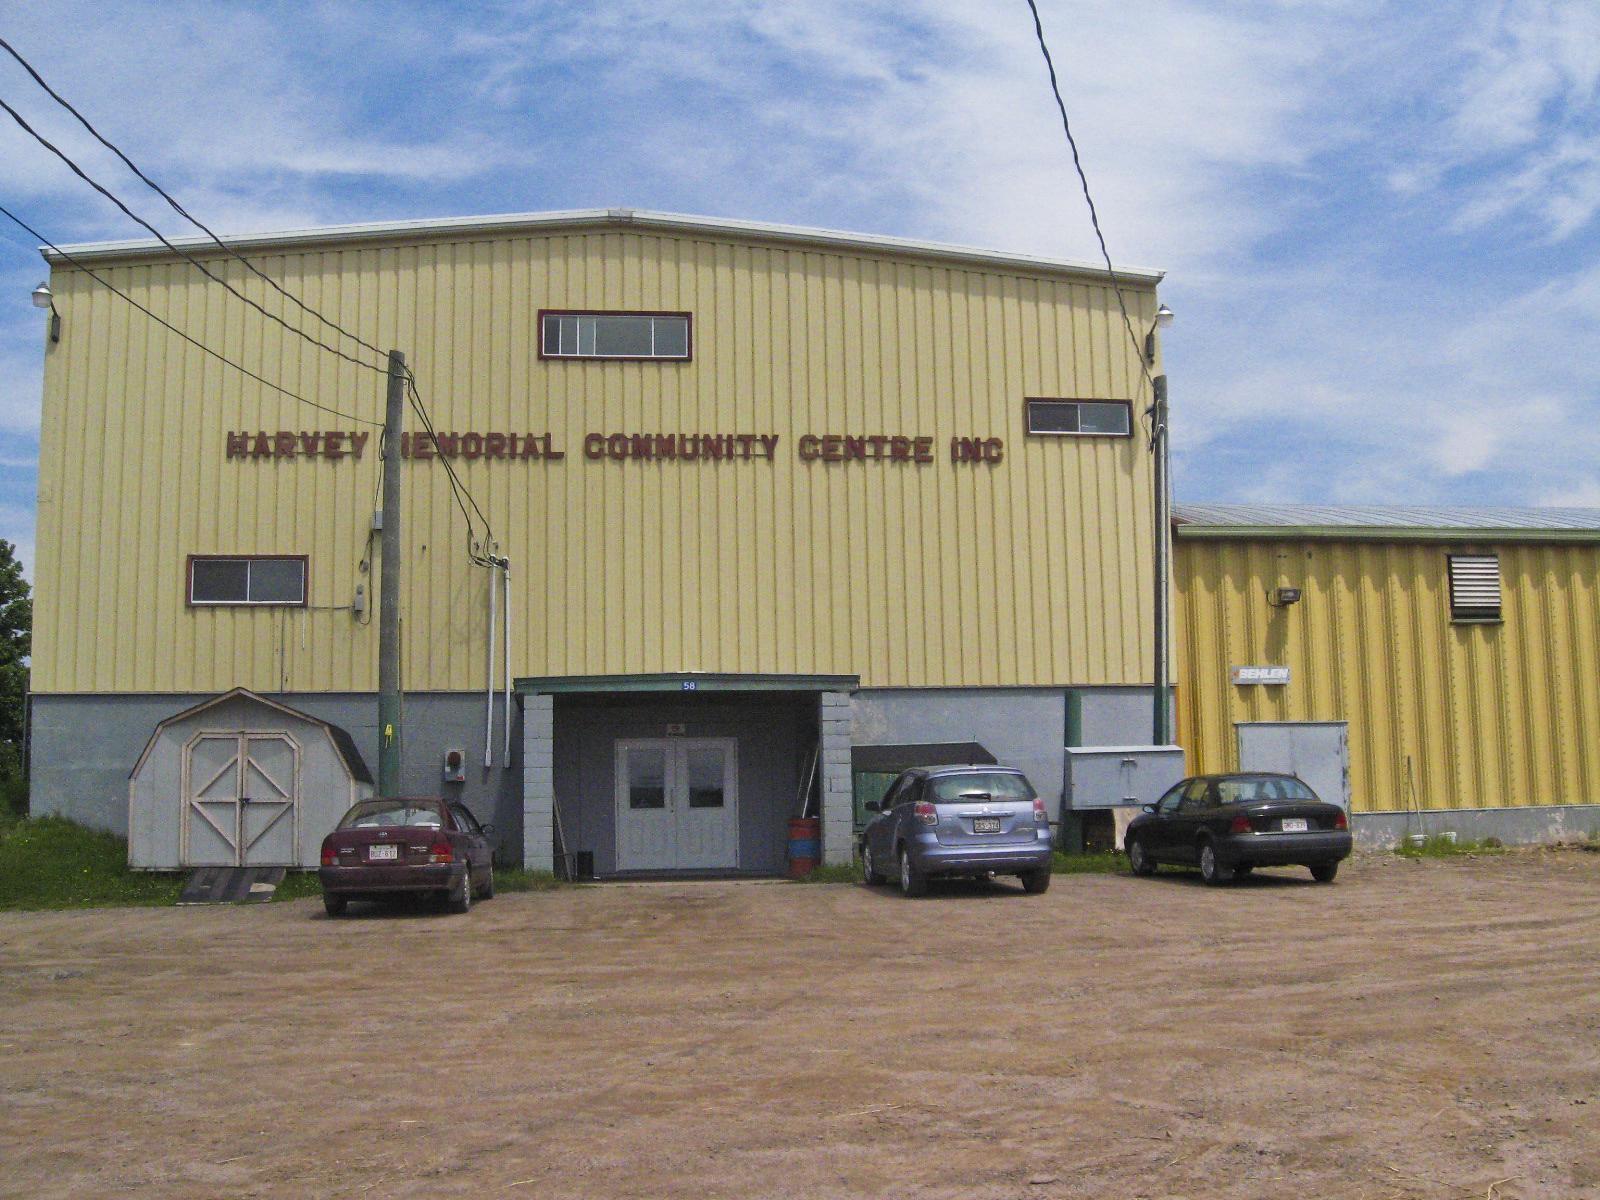 Harvey Memorial Community Center